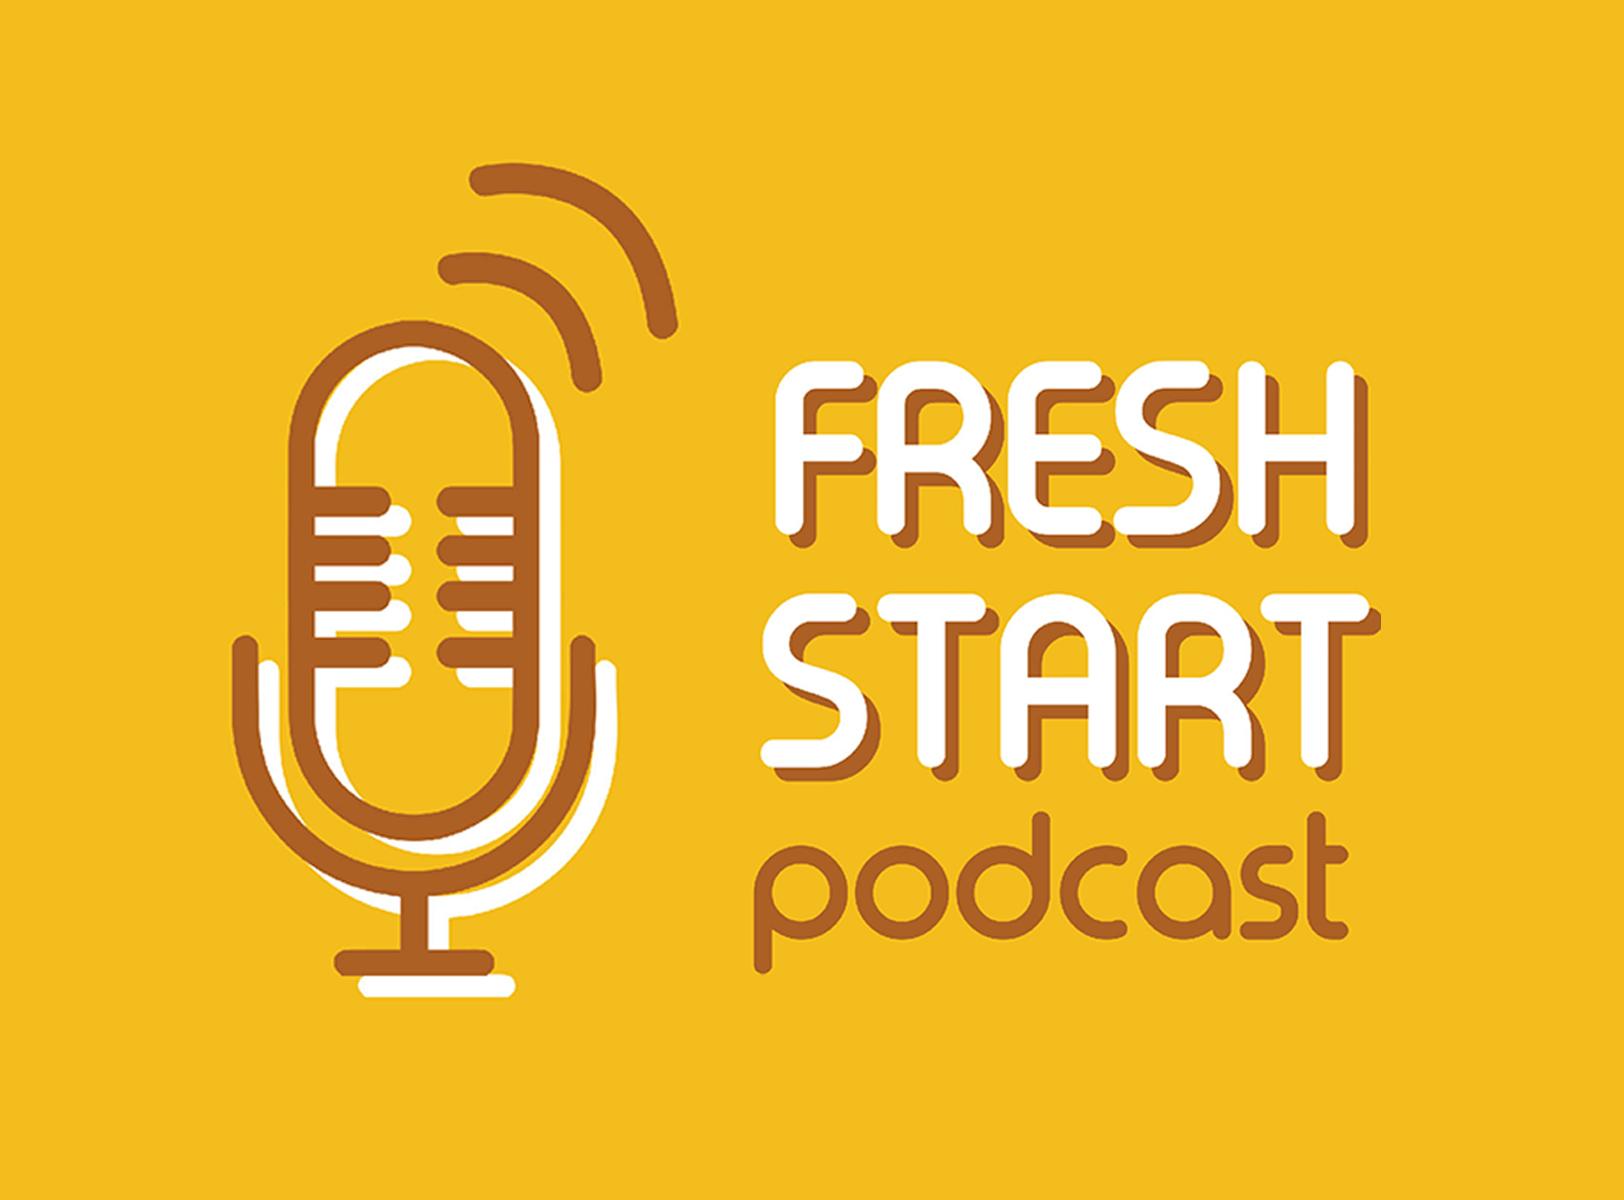 Fresh Start: Podcast News (4/20/2020 Mon.)